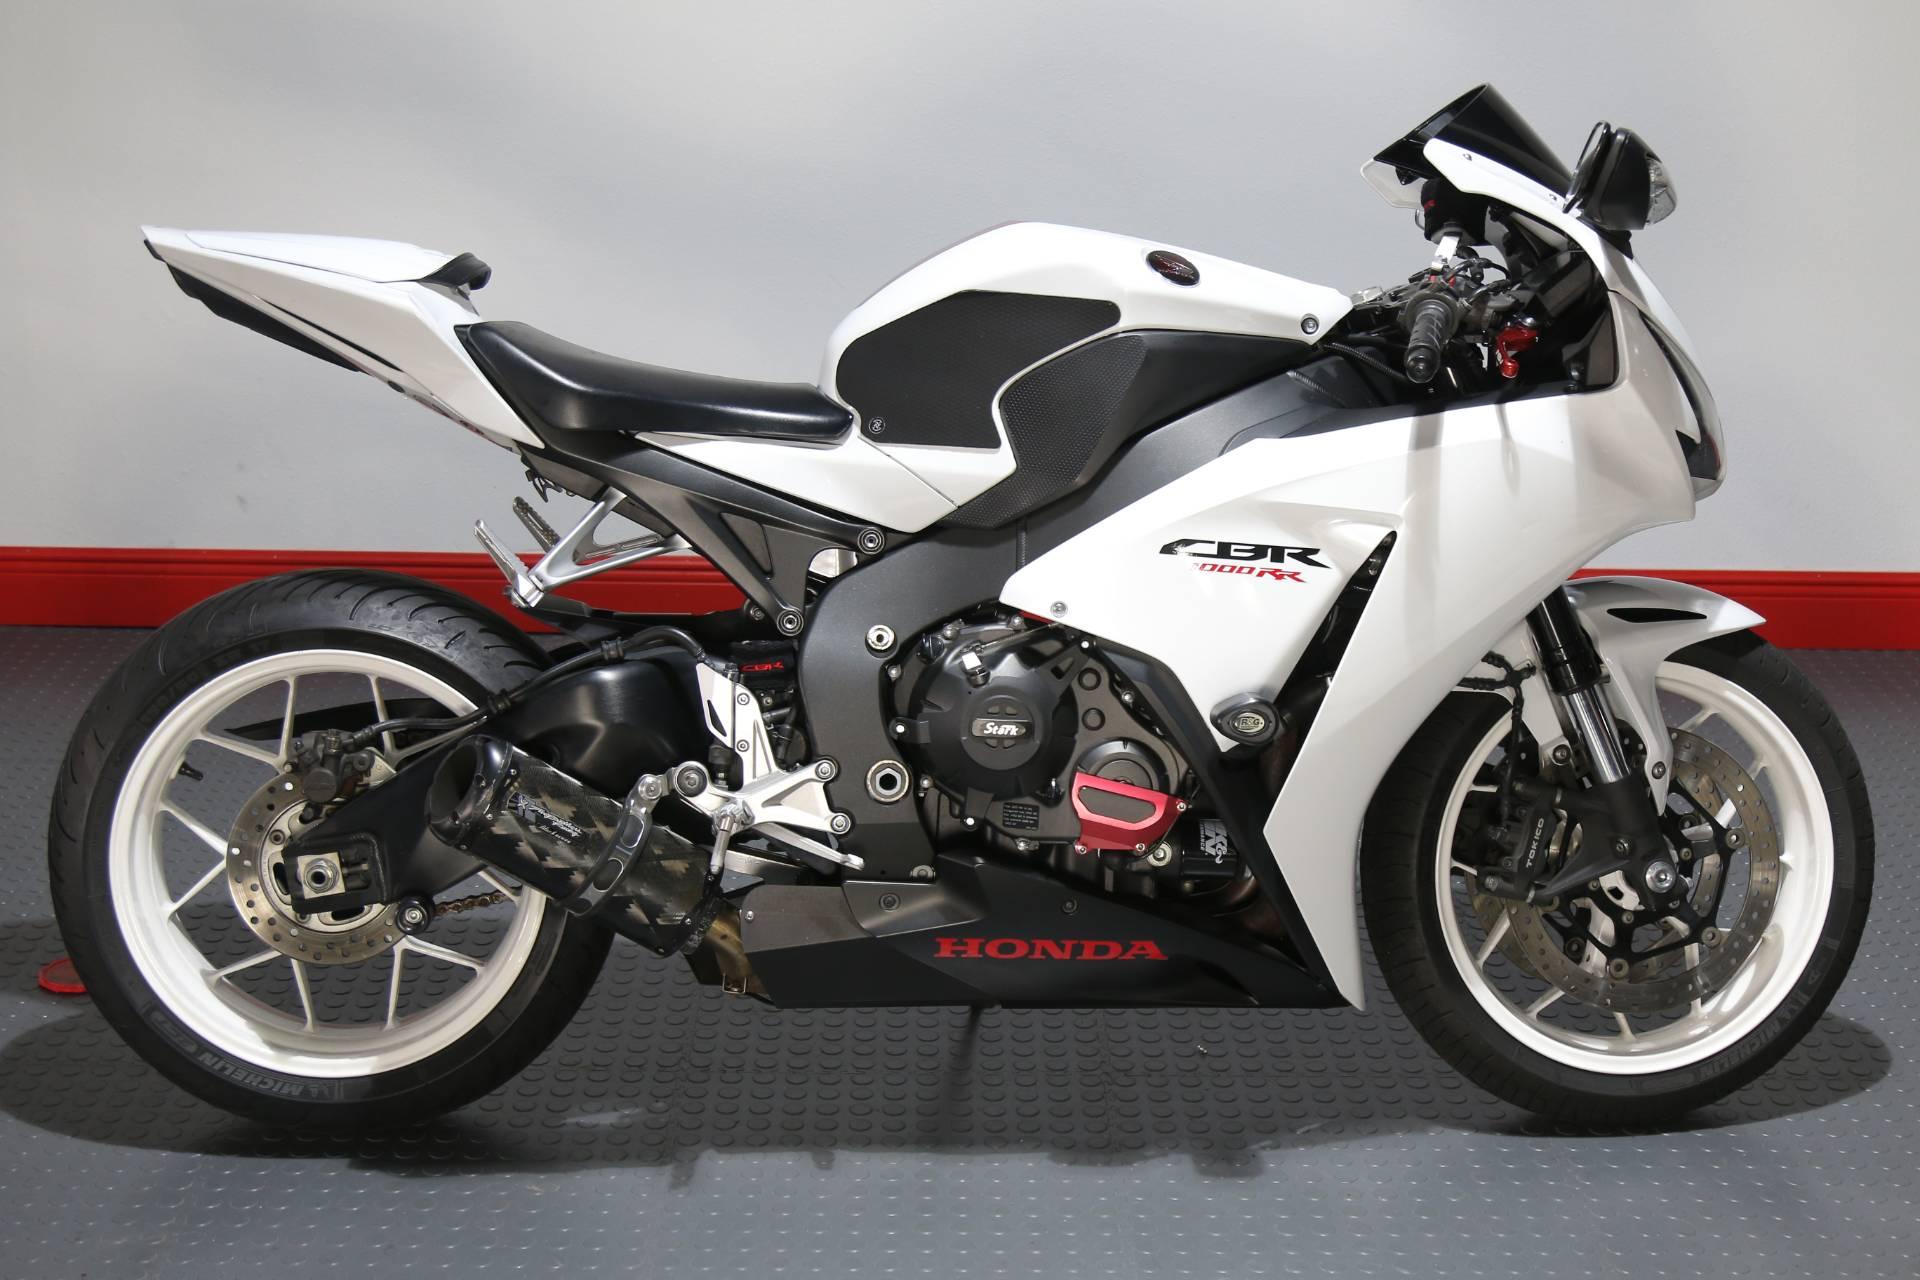 Used 2014 Honda CBR®1000RR Motorcycles in Pinellas Park, FL